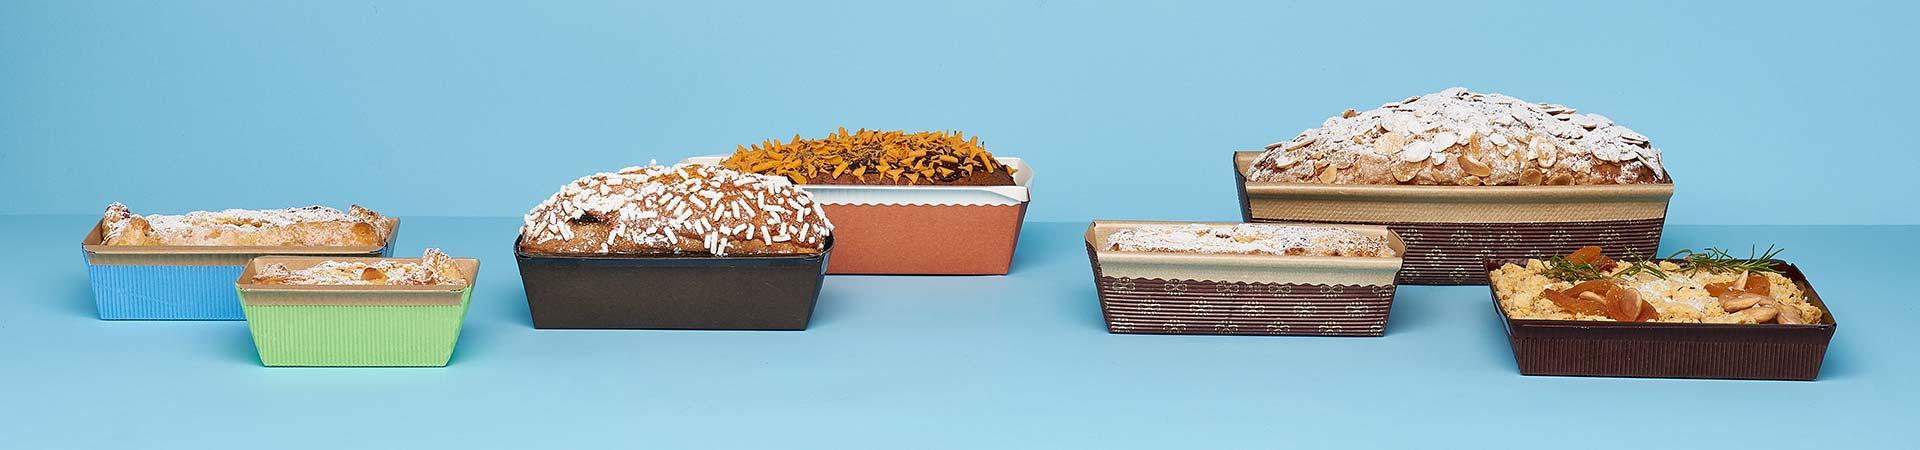 Novacart plum cake baking molds